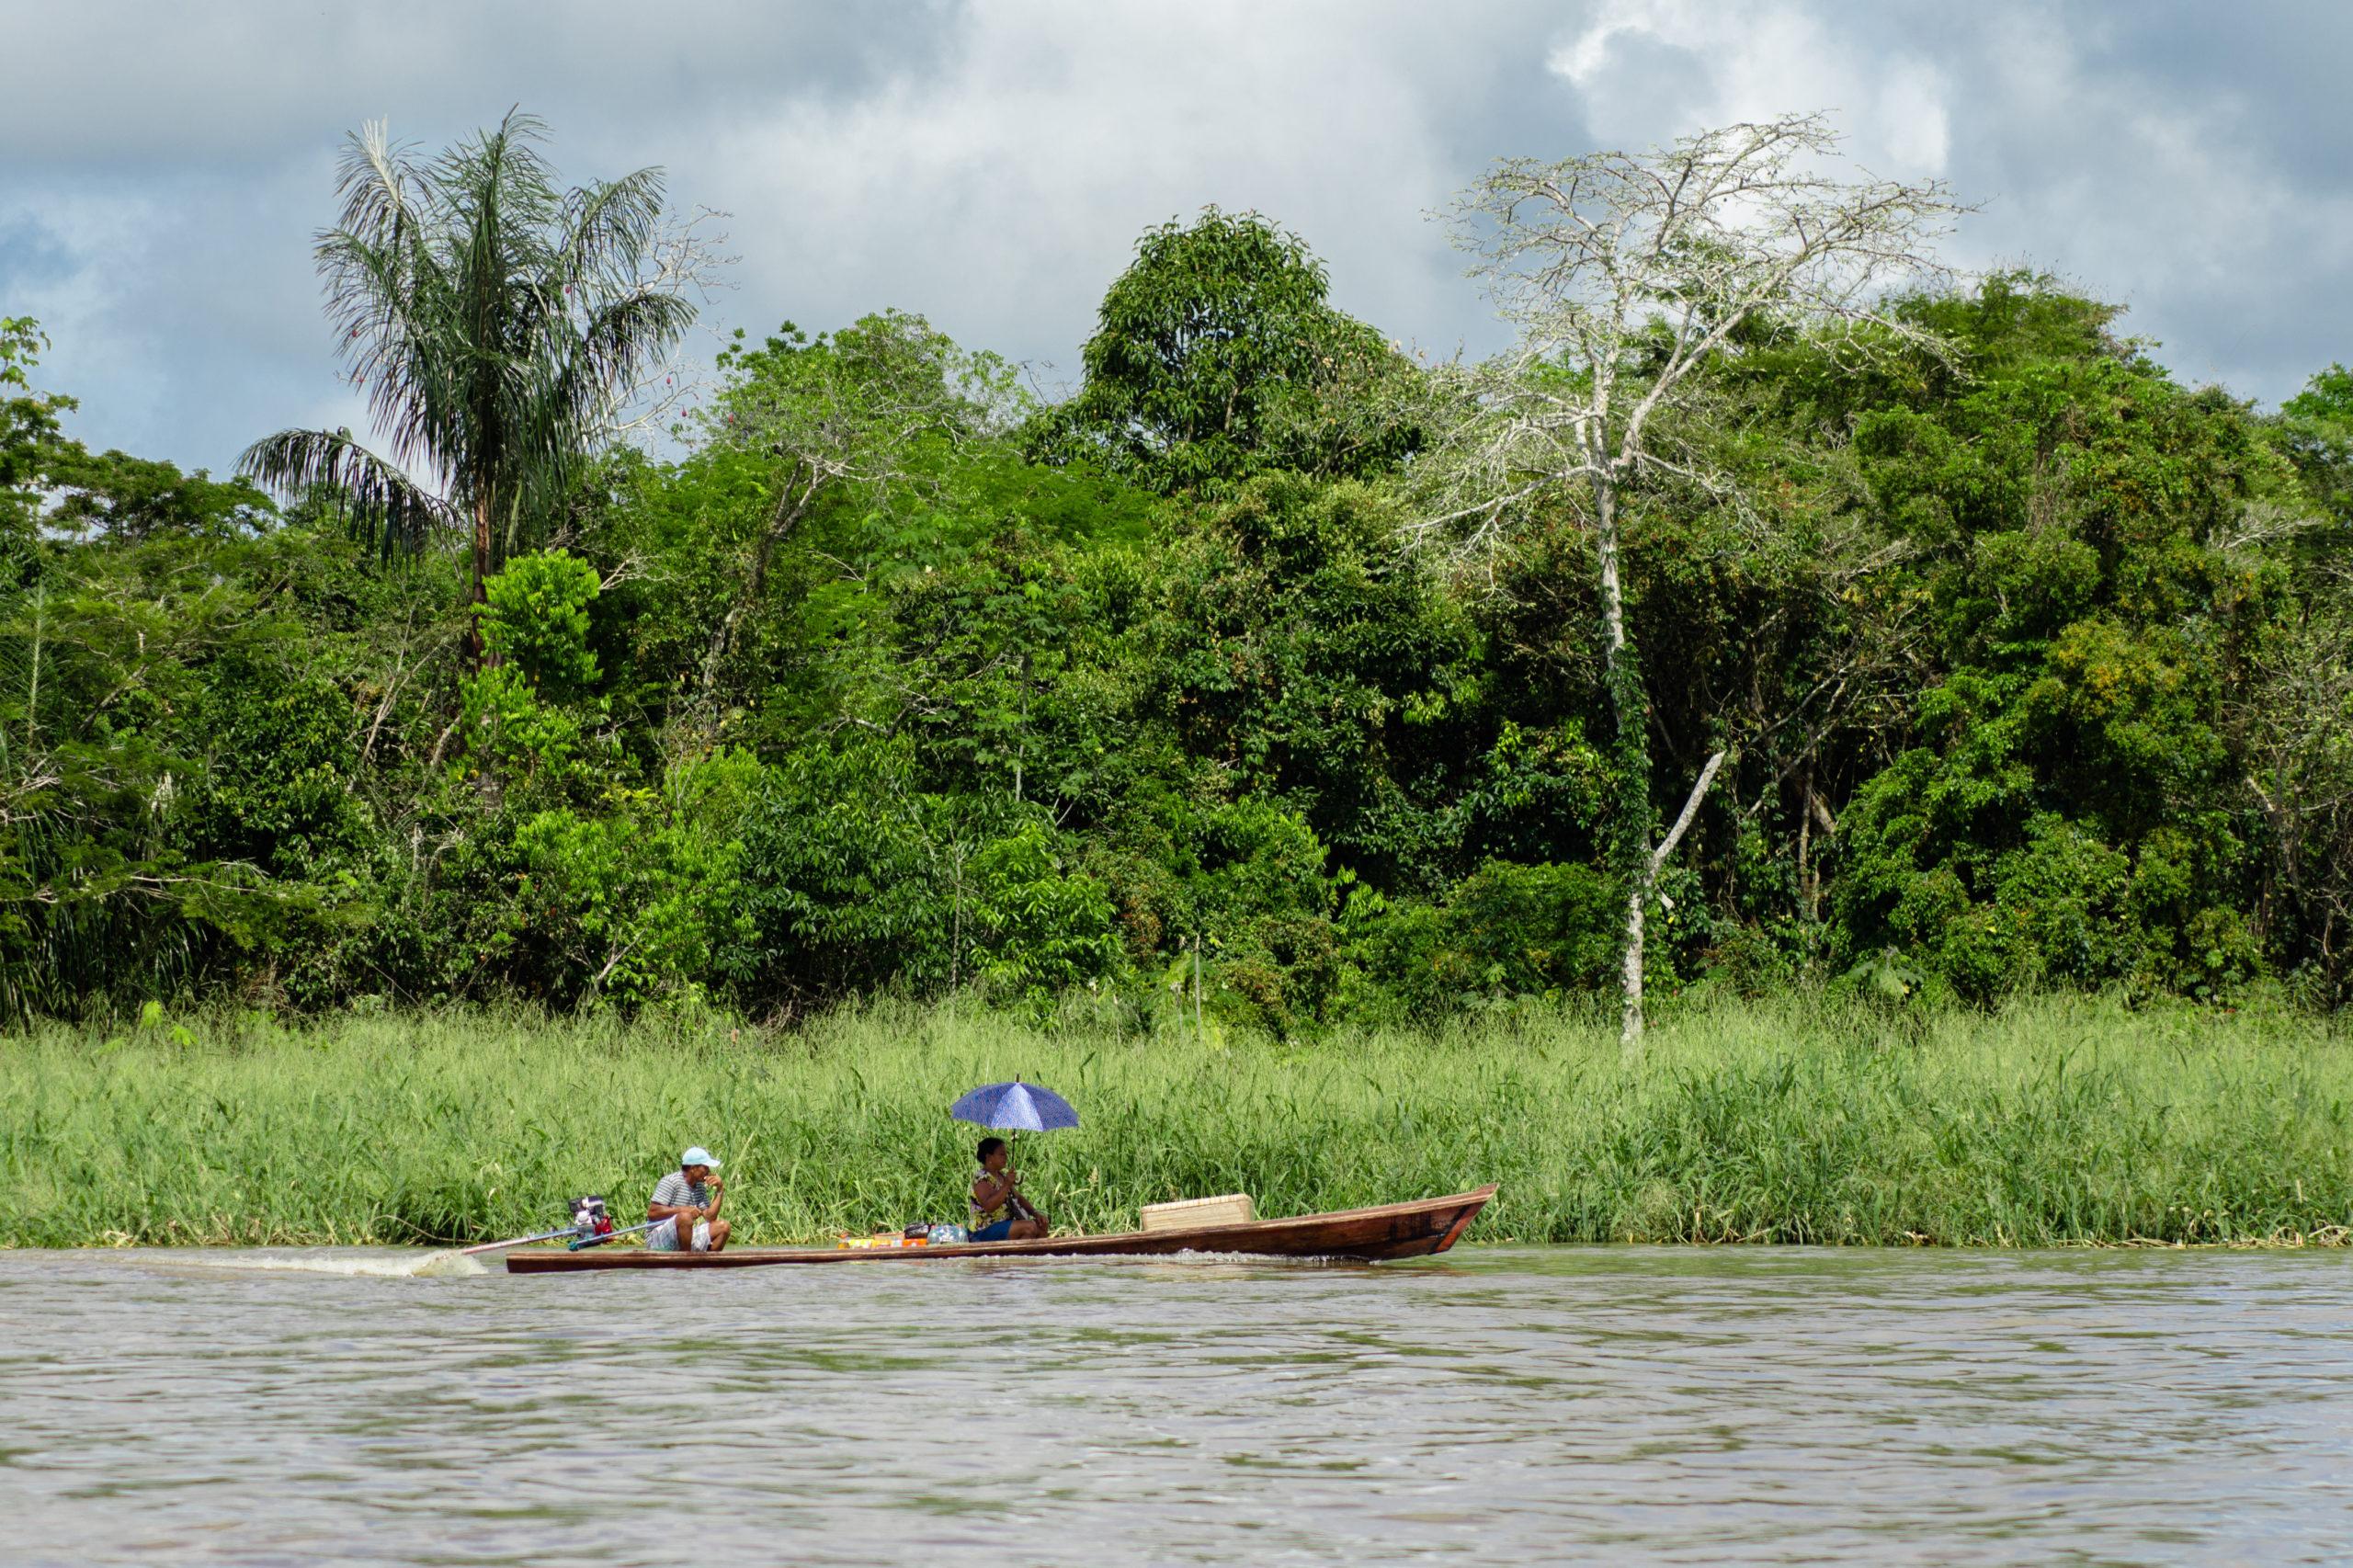 Donan 21 mil millones de pesos para proteger la Amazonia Colombiana